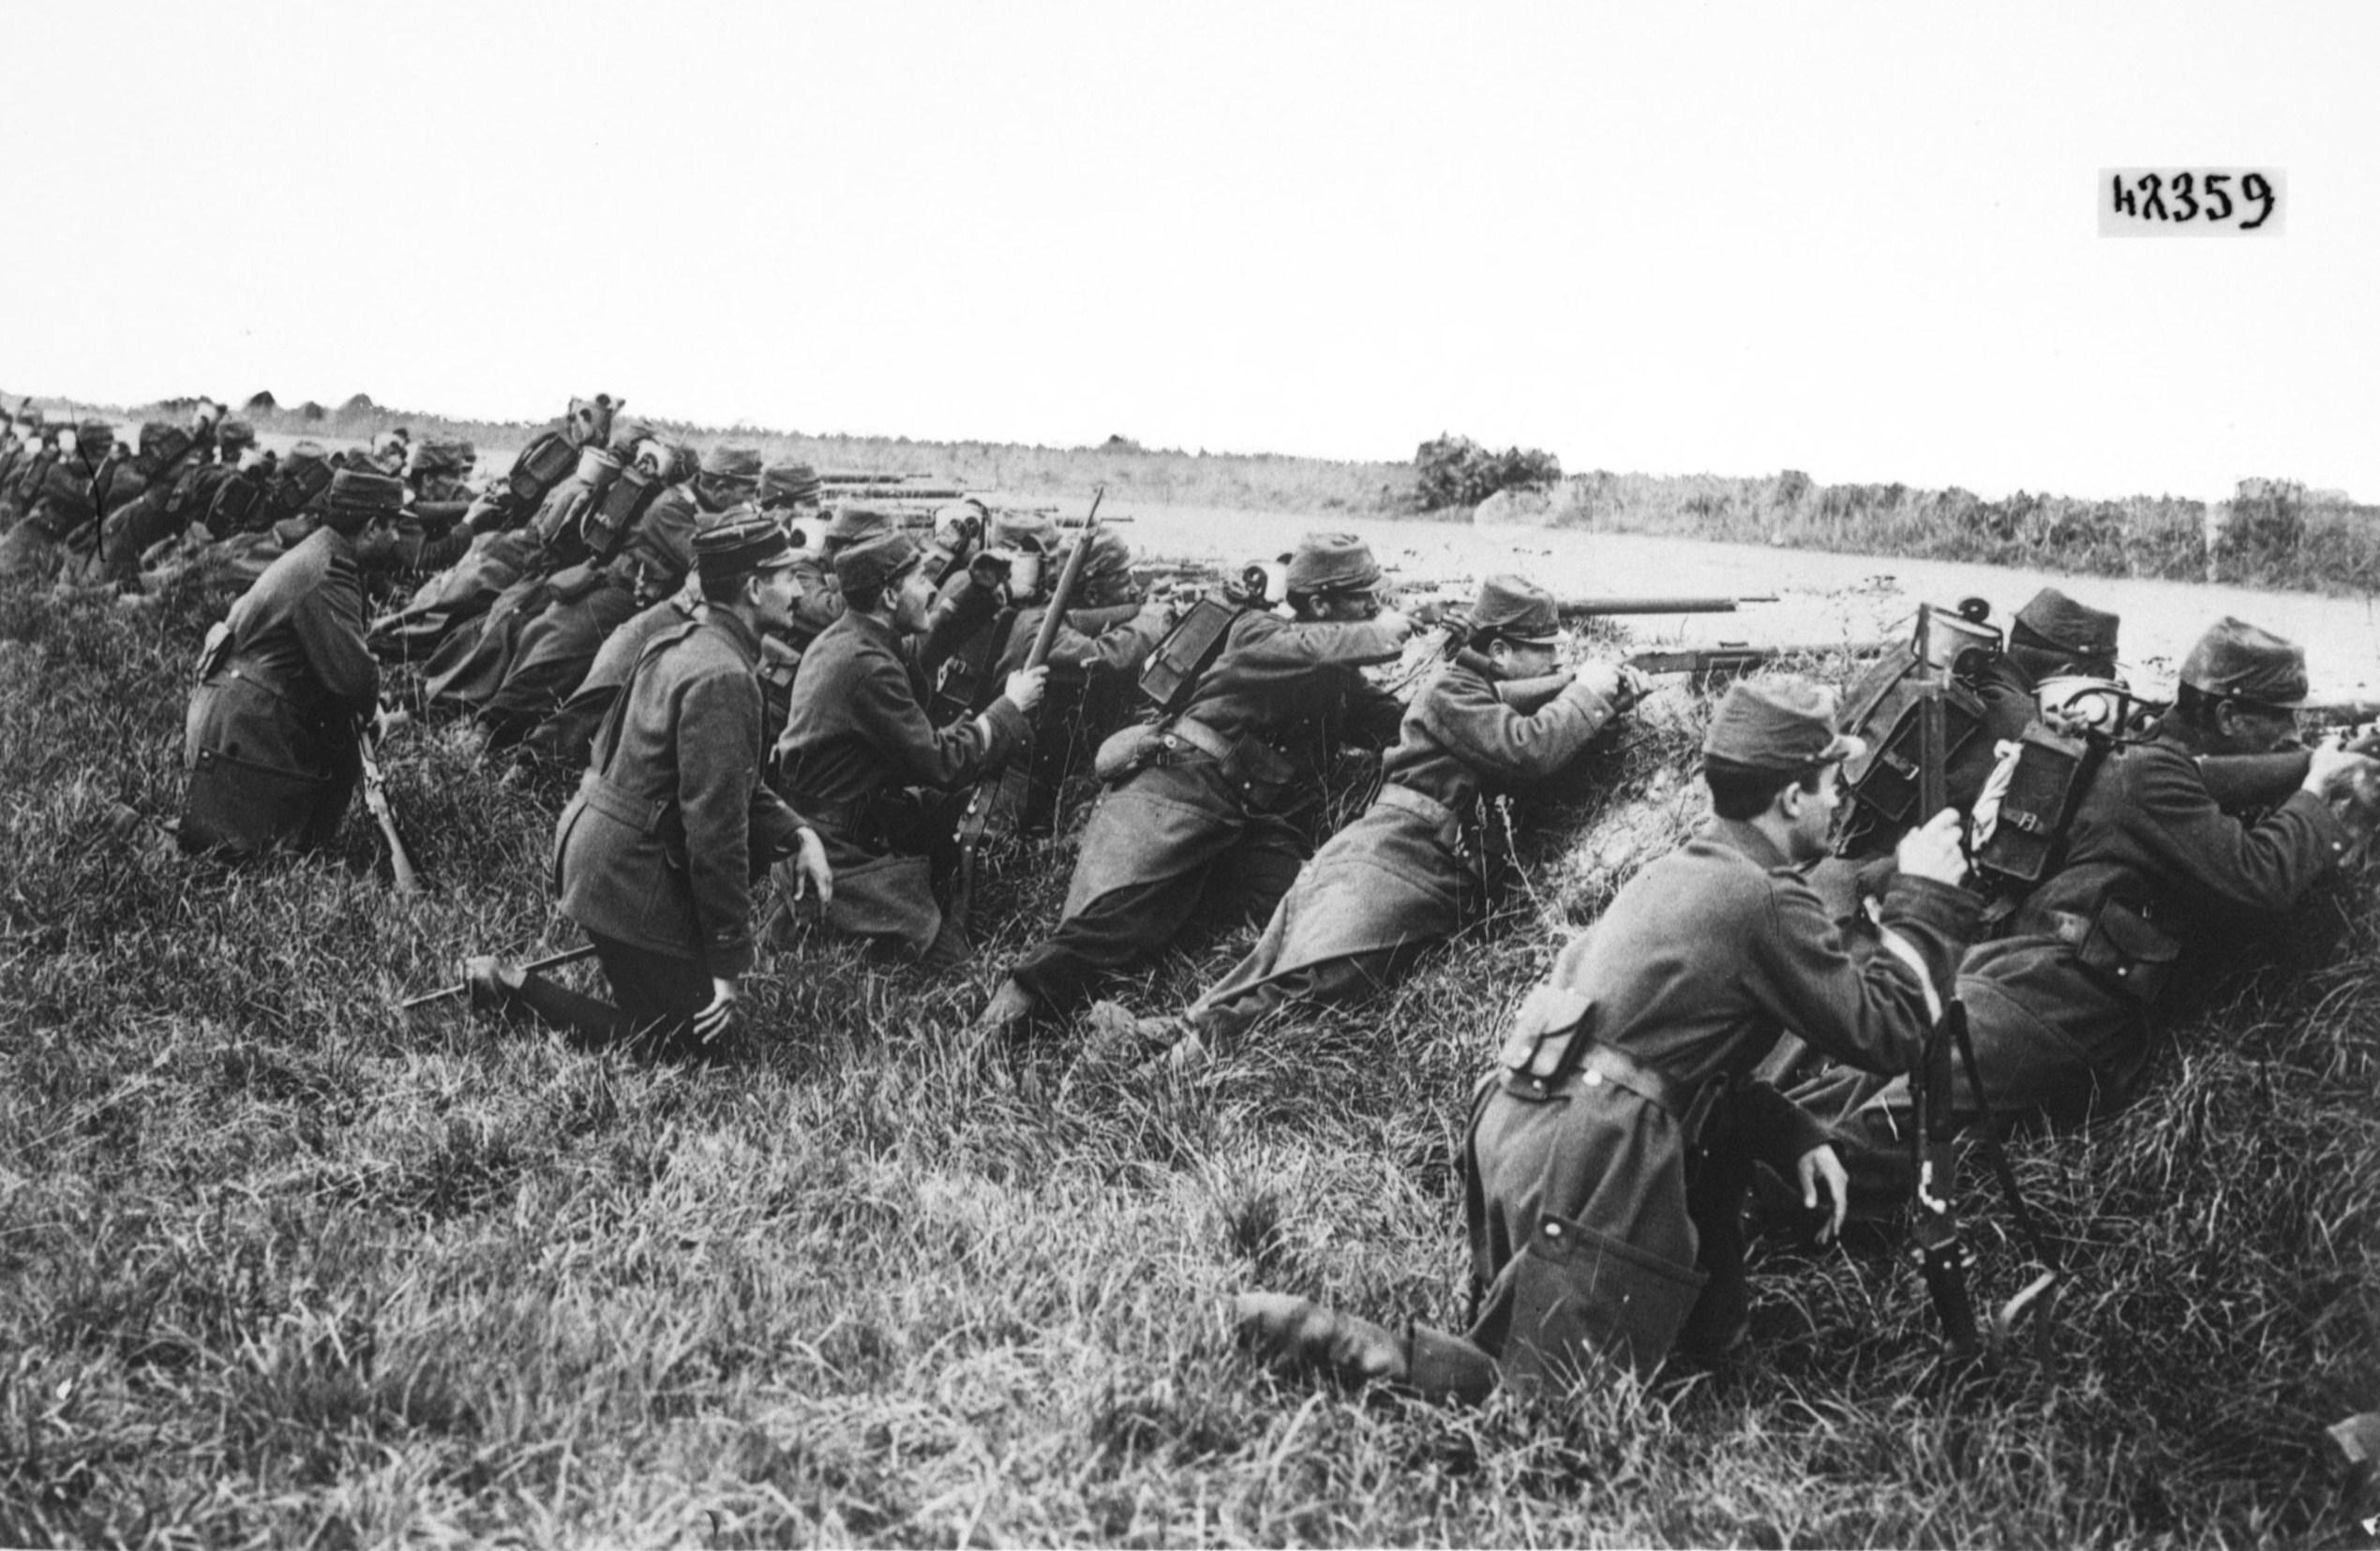 Corso sulla Grande guerra